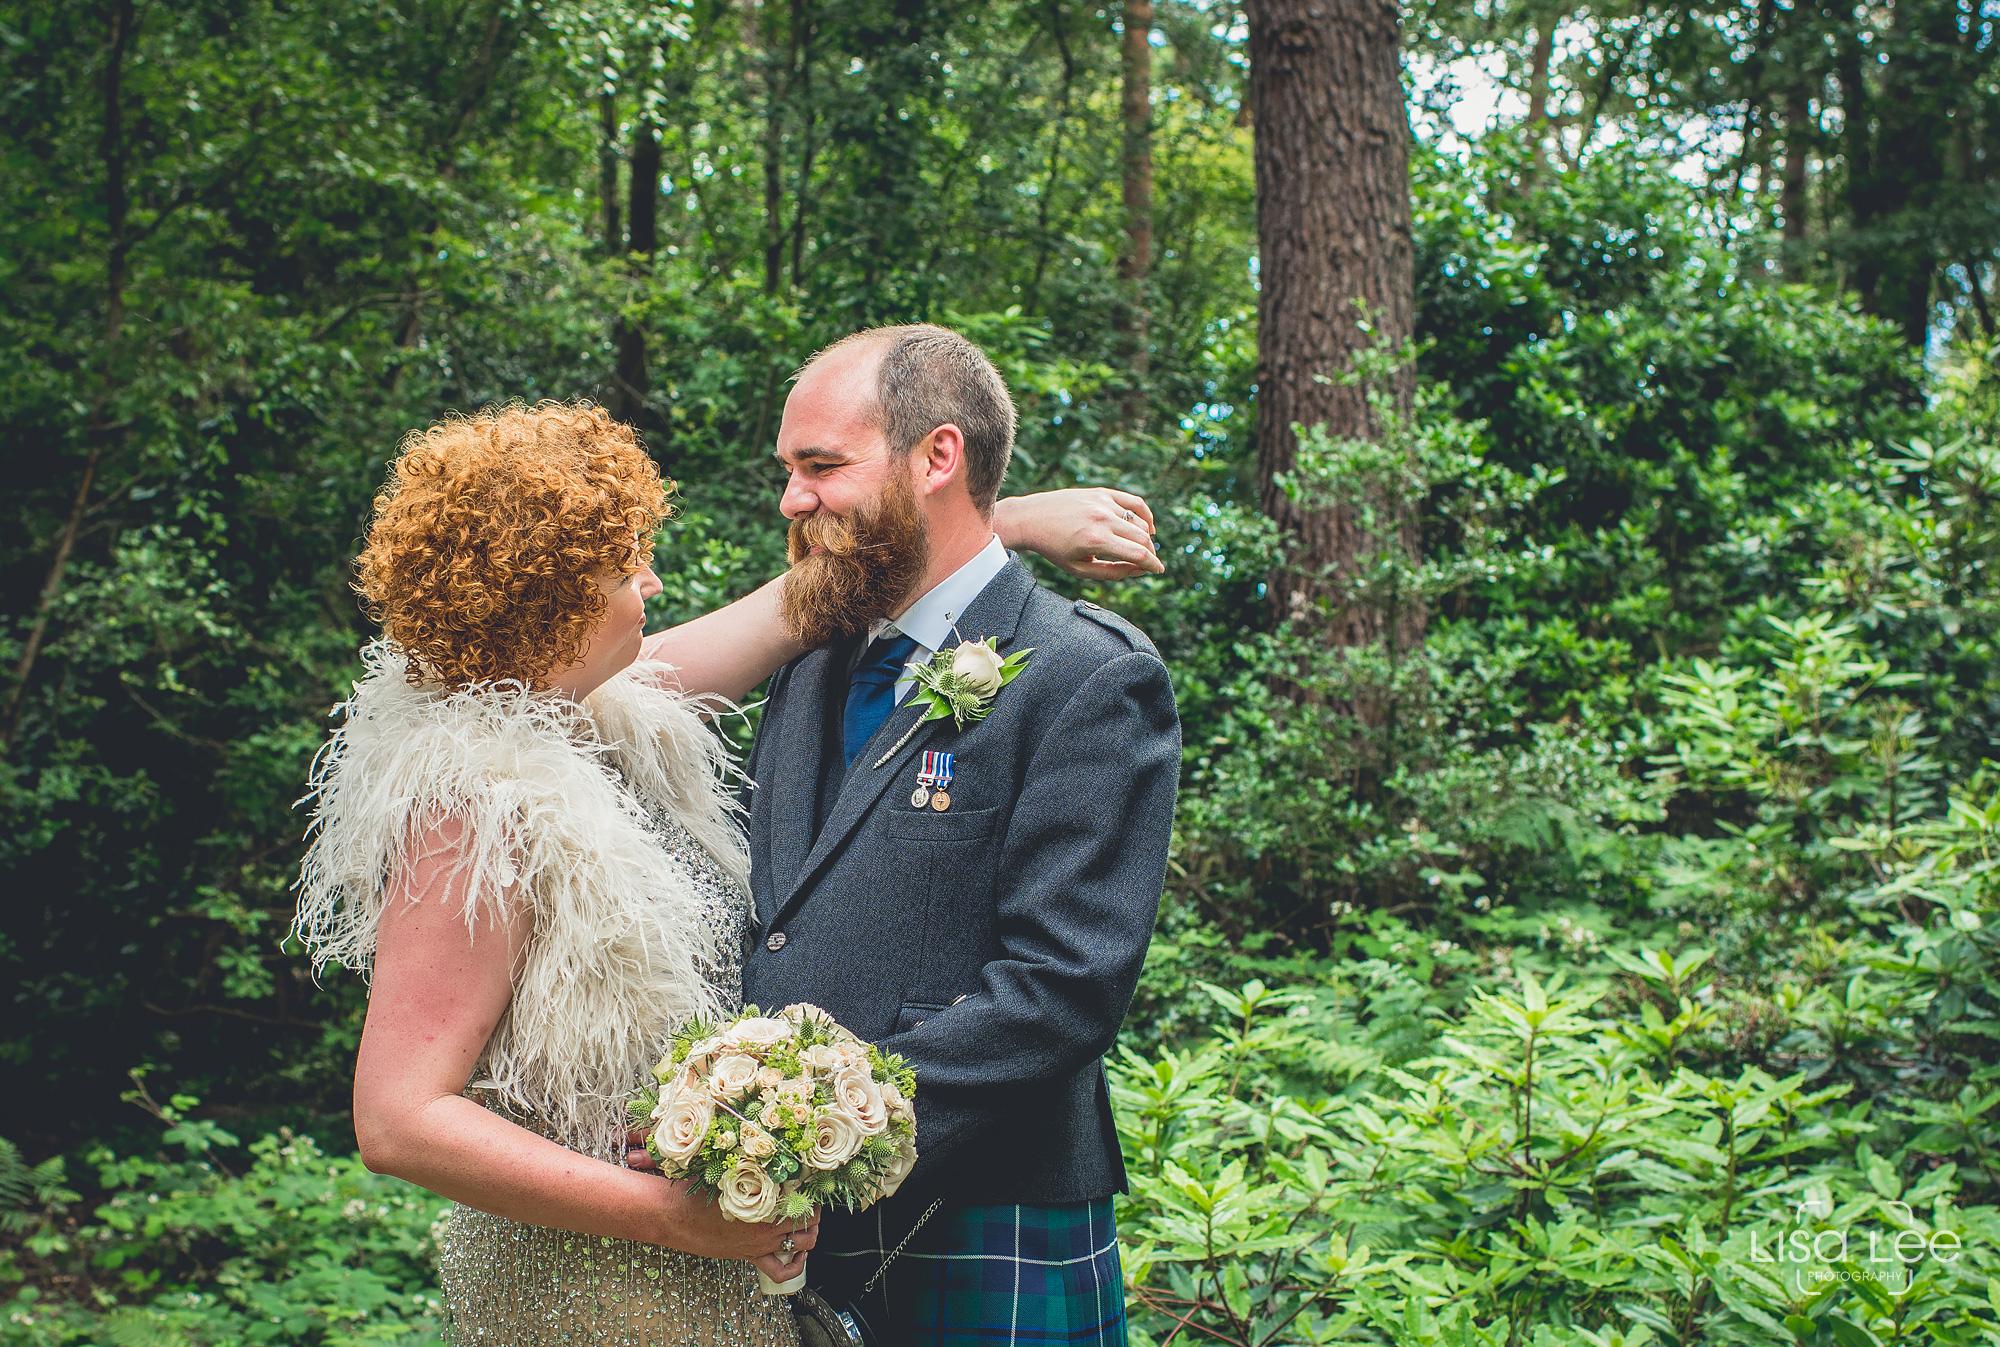 lisa-lee-wedding-photography-couple-confetti-talbot-heath-5.jpg